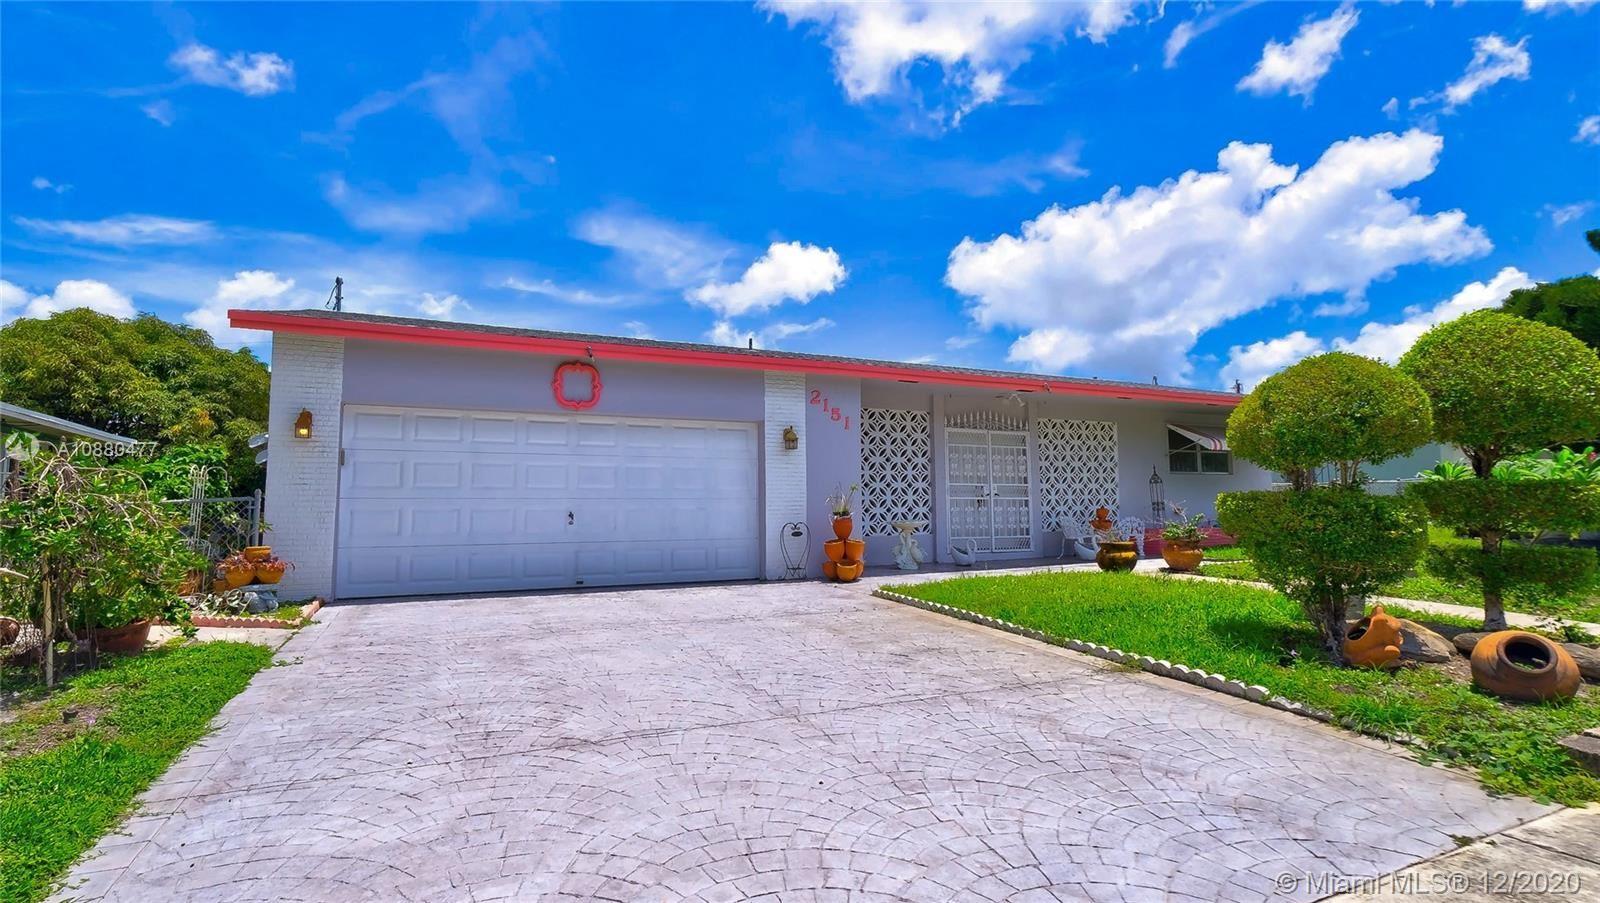 2151 NW 131st St, Miami, FL 33167 - #: A10880477